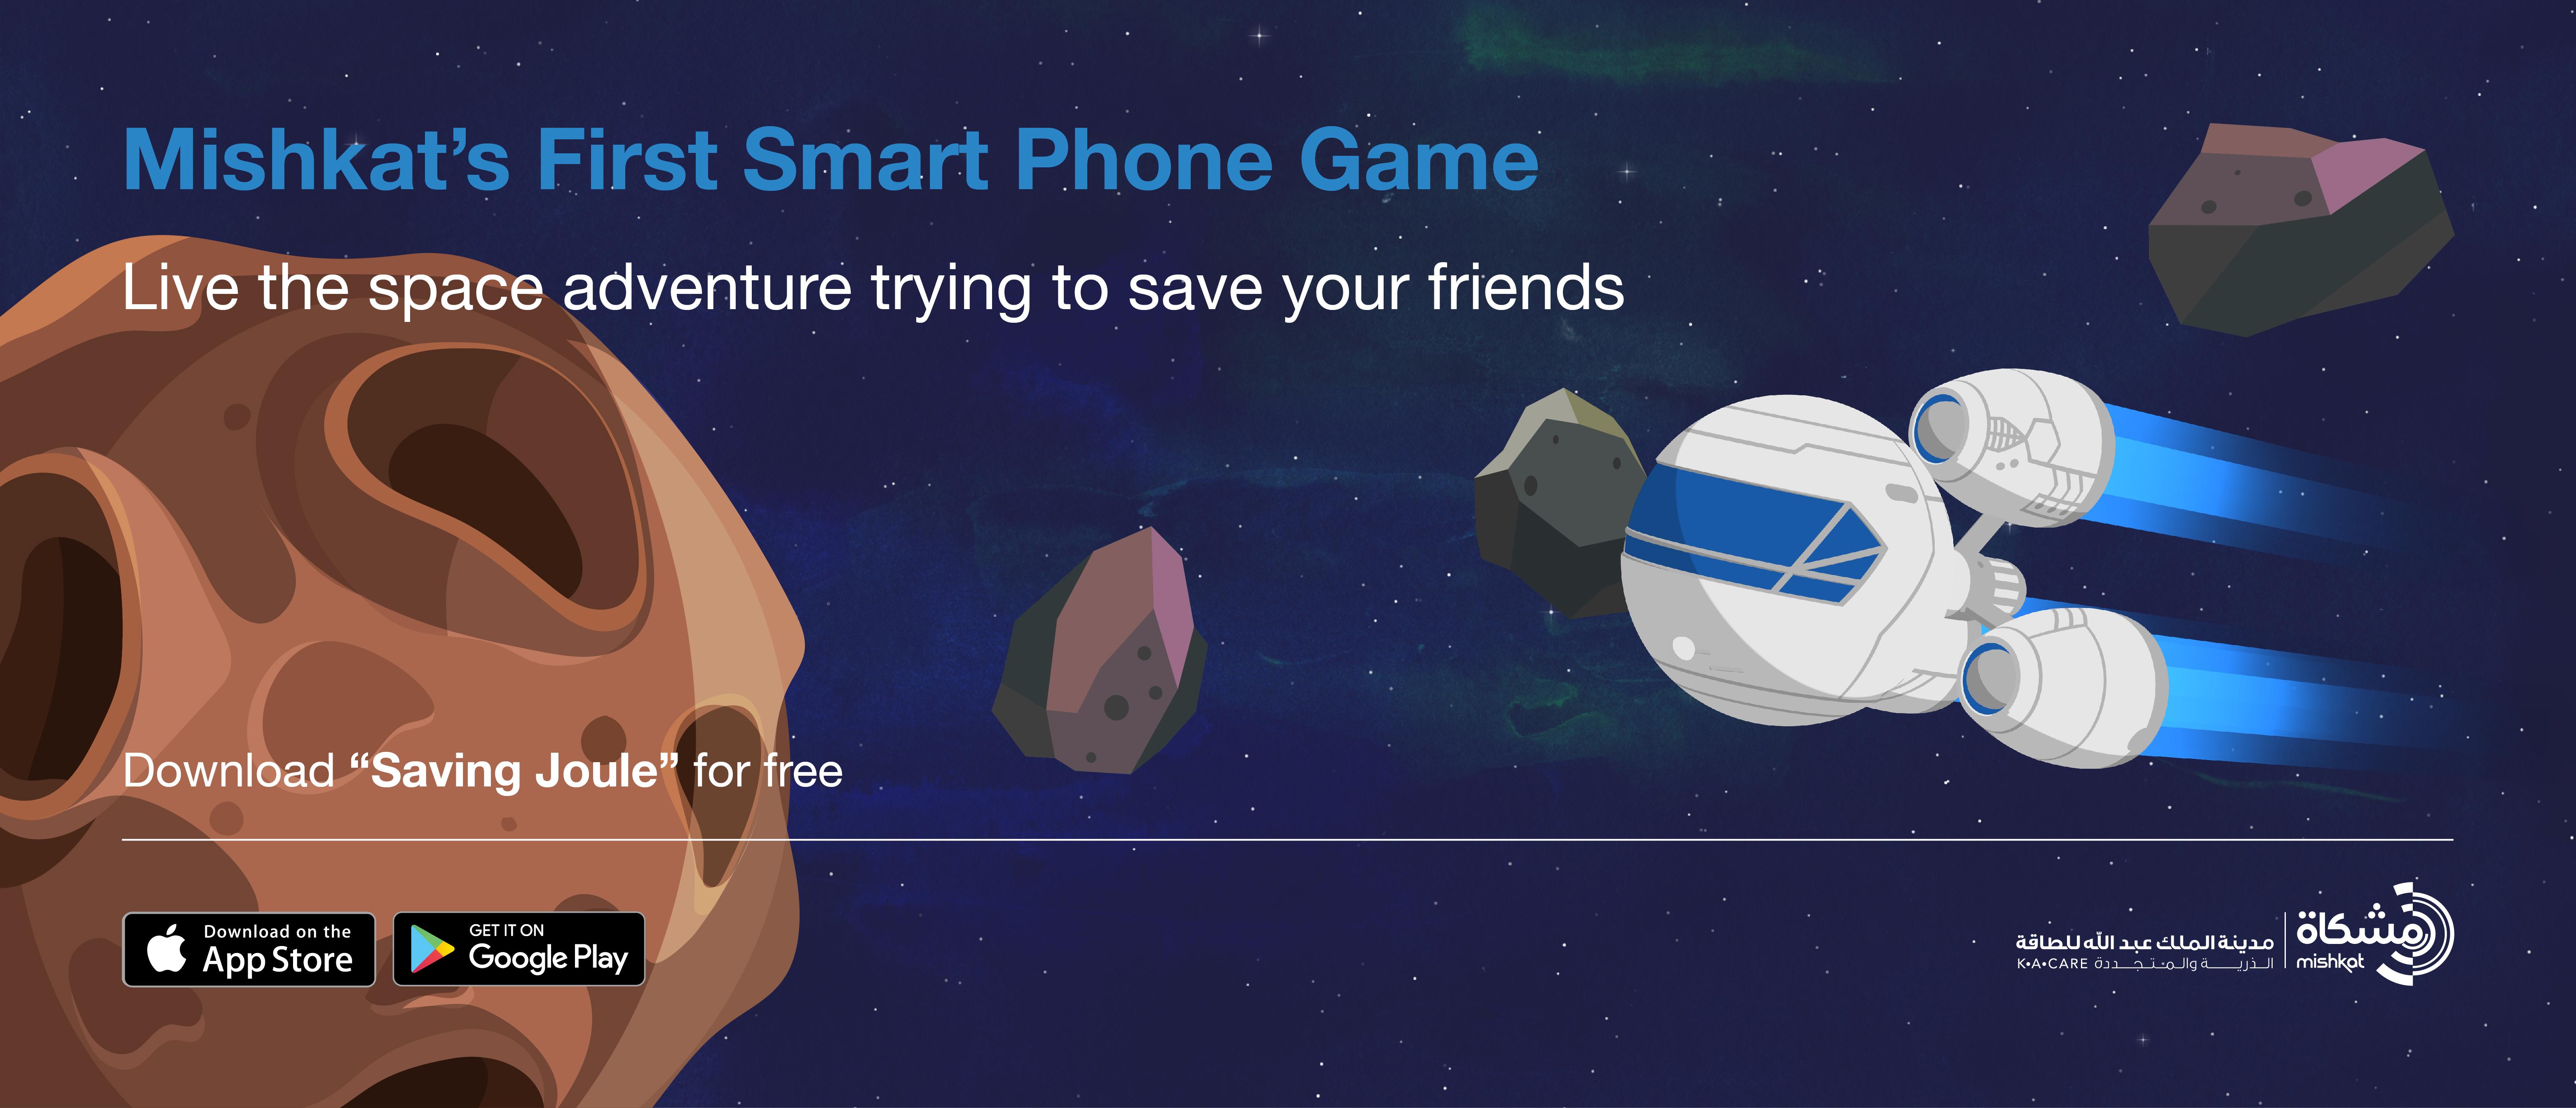 saving joule game mishkat interactive center